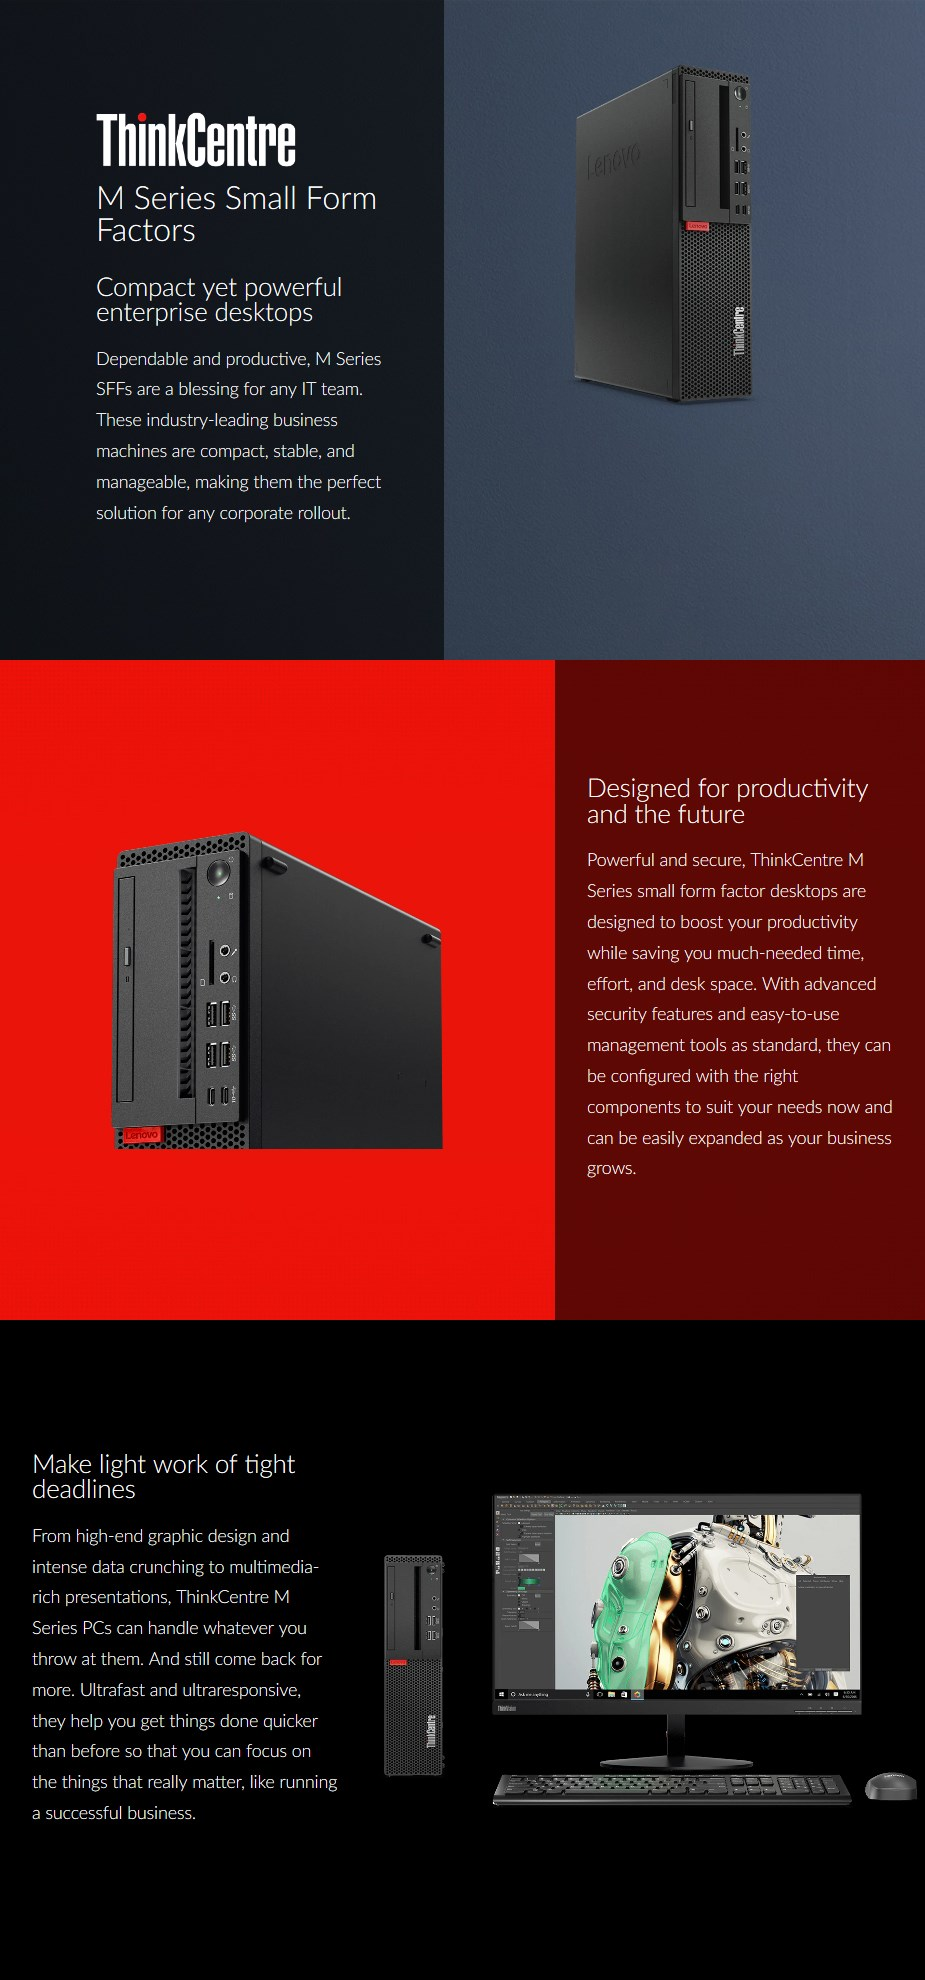 Lenovo M920 SFF PC i5-9500 8GB 256GB WiFi + BT Win10 Pro - Desktop Overview 1